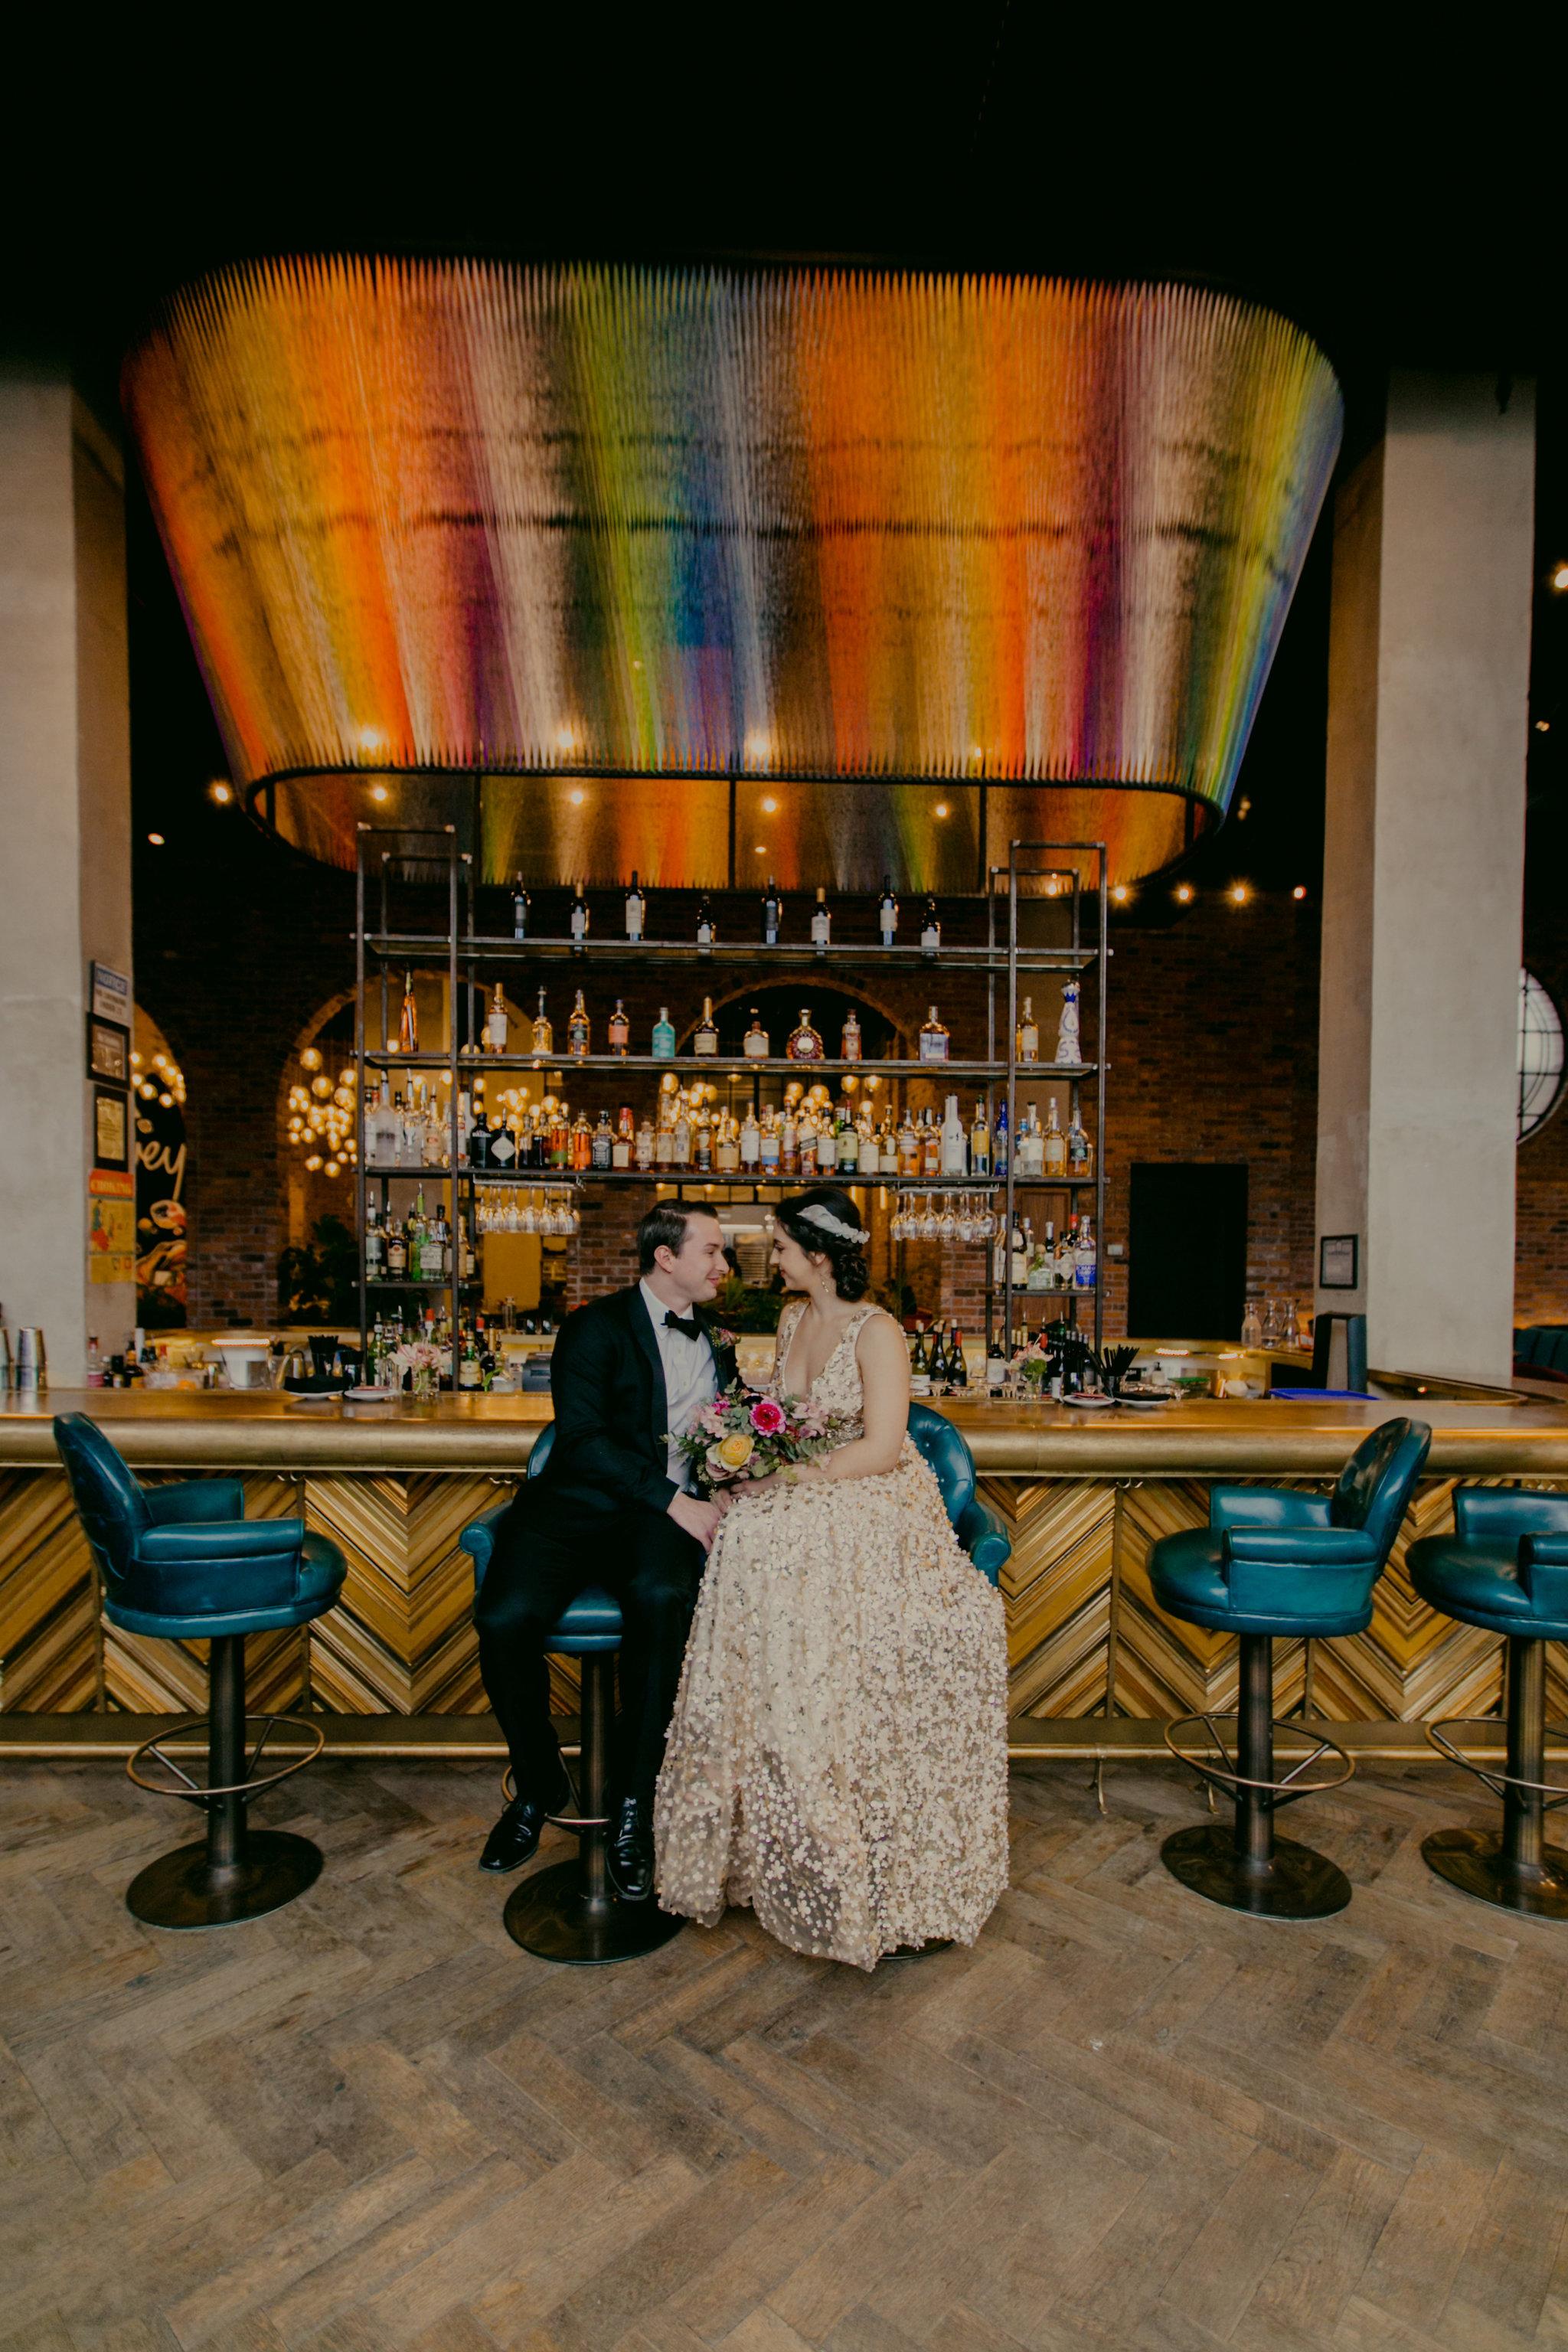 Williamsburg_Hotel_Wedding_Photographer_Chellise_Michael_Photography-162.jpg